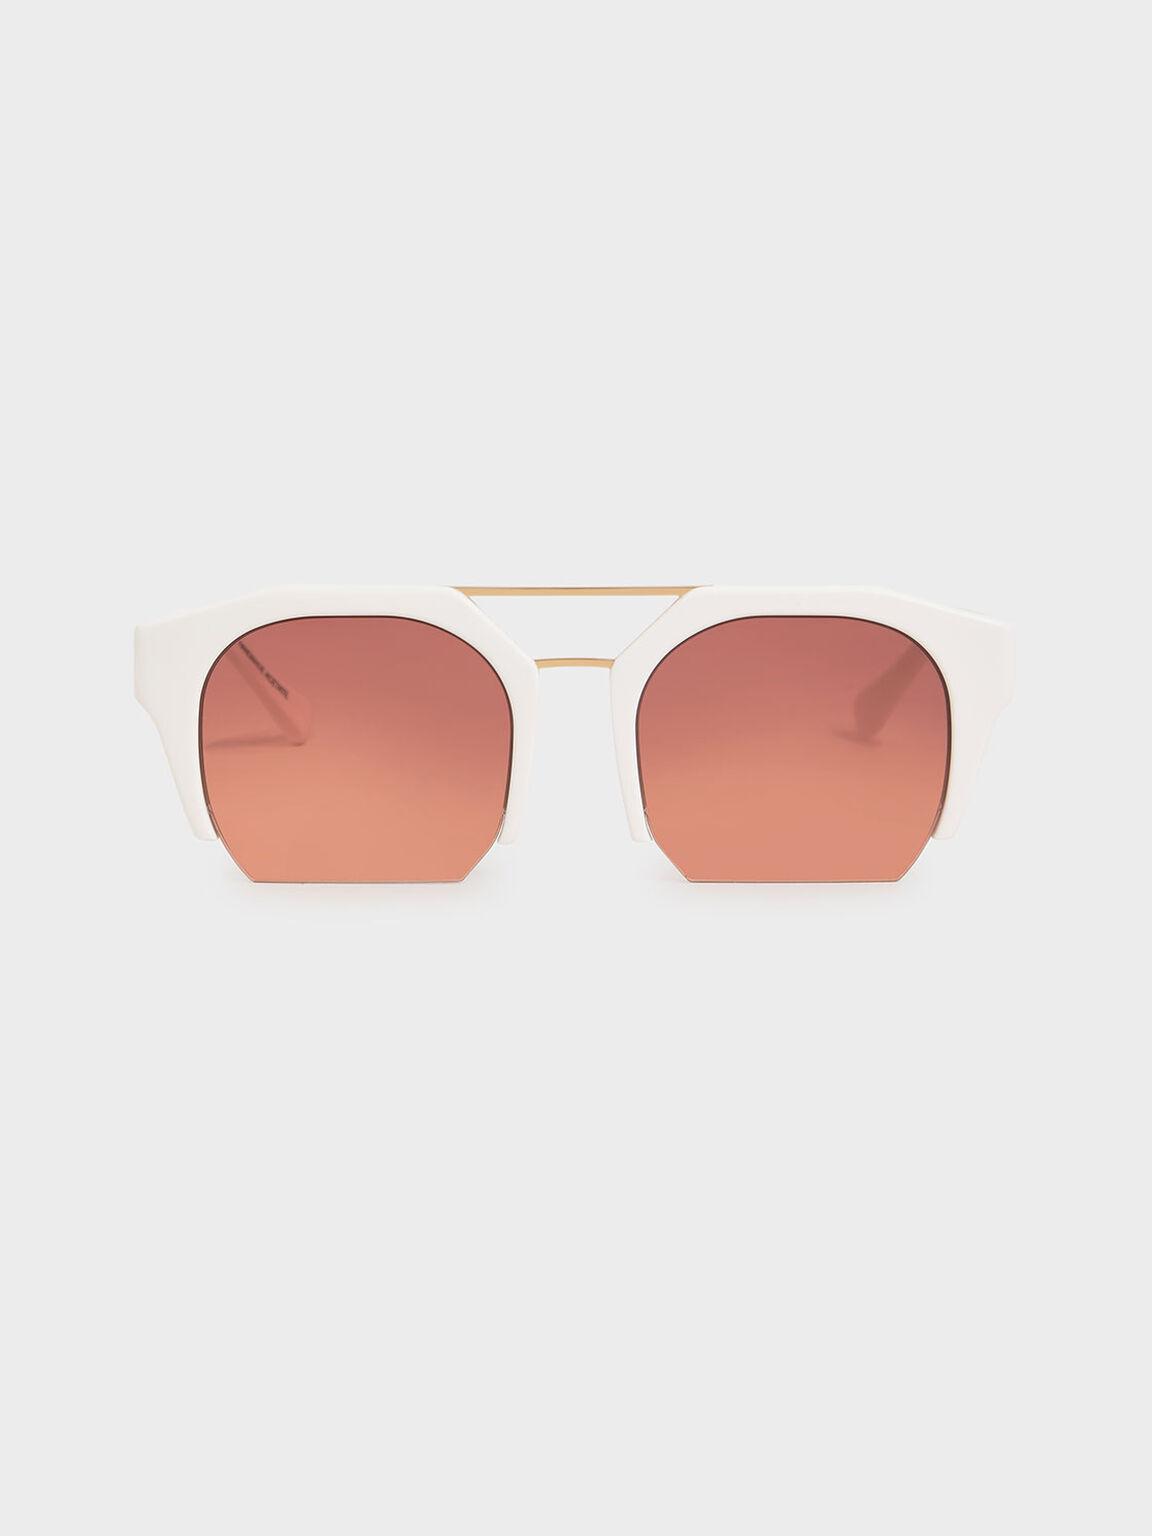 Cut-Off Frame Geometric Sunglasses, Mauve, hi-res